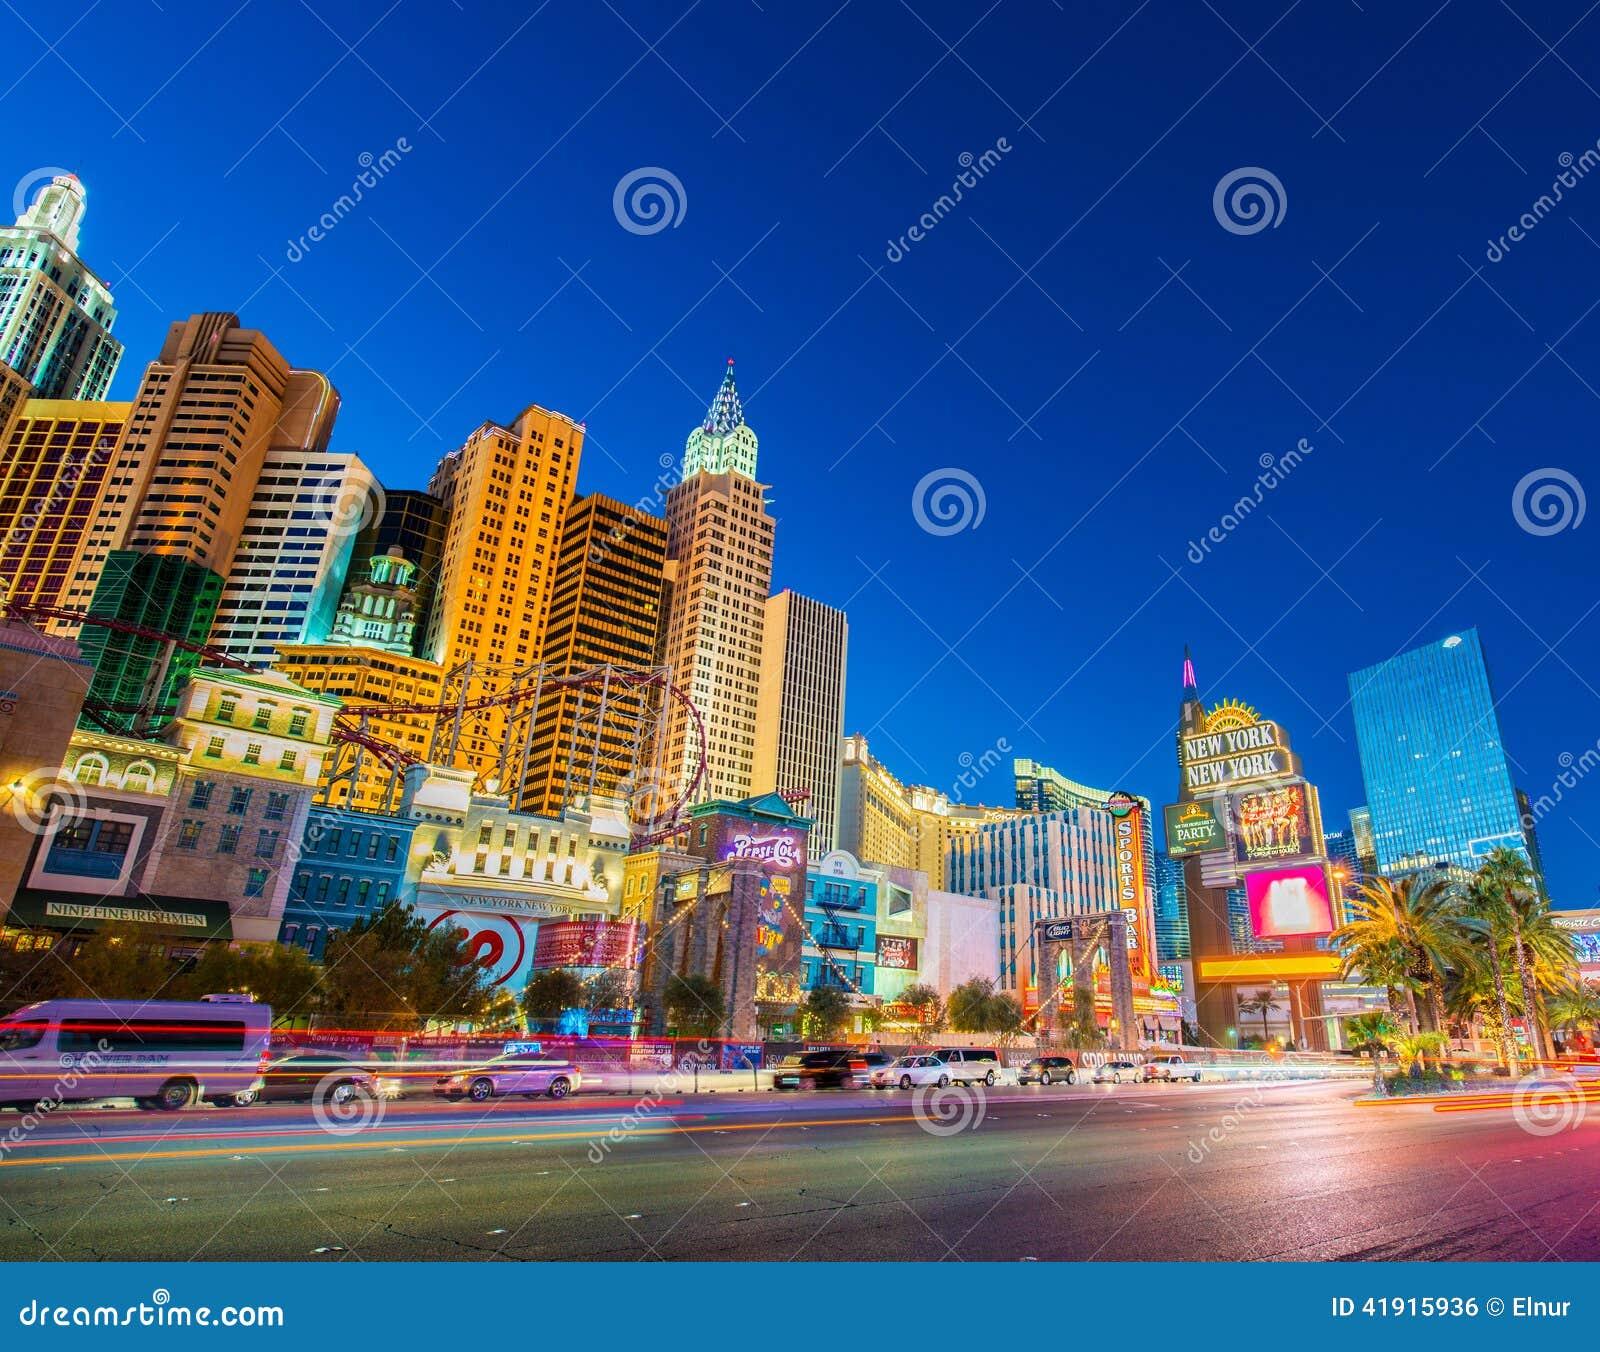 New York-New York casino on December 21